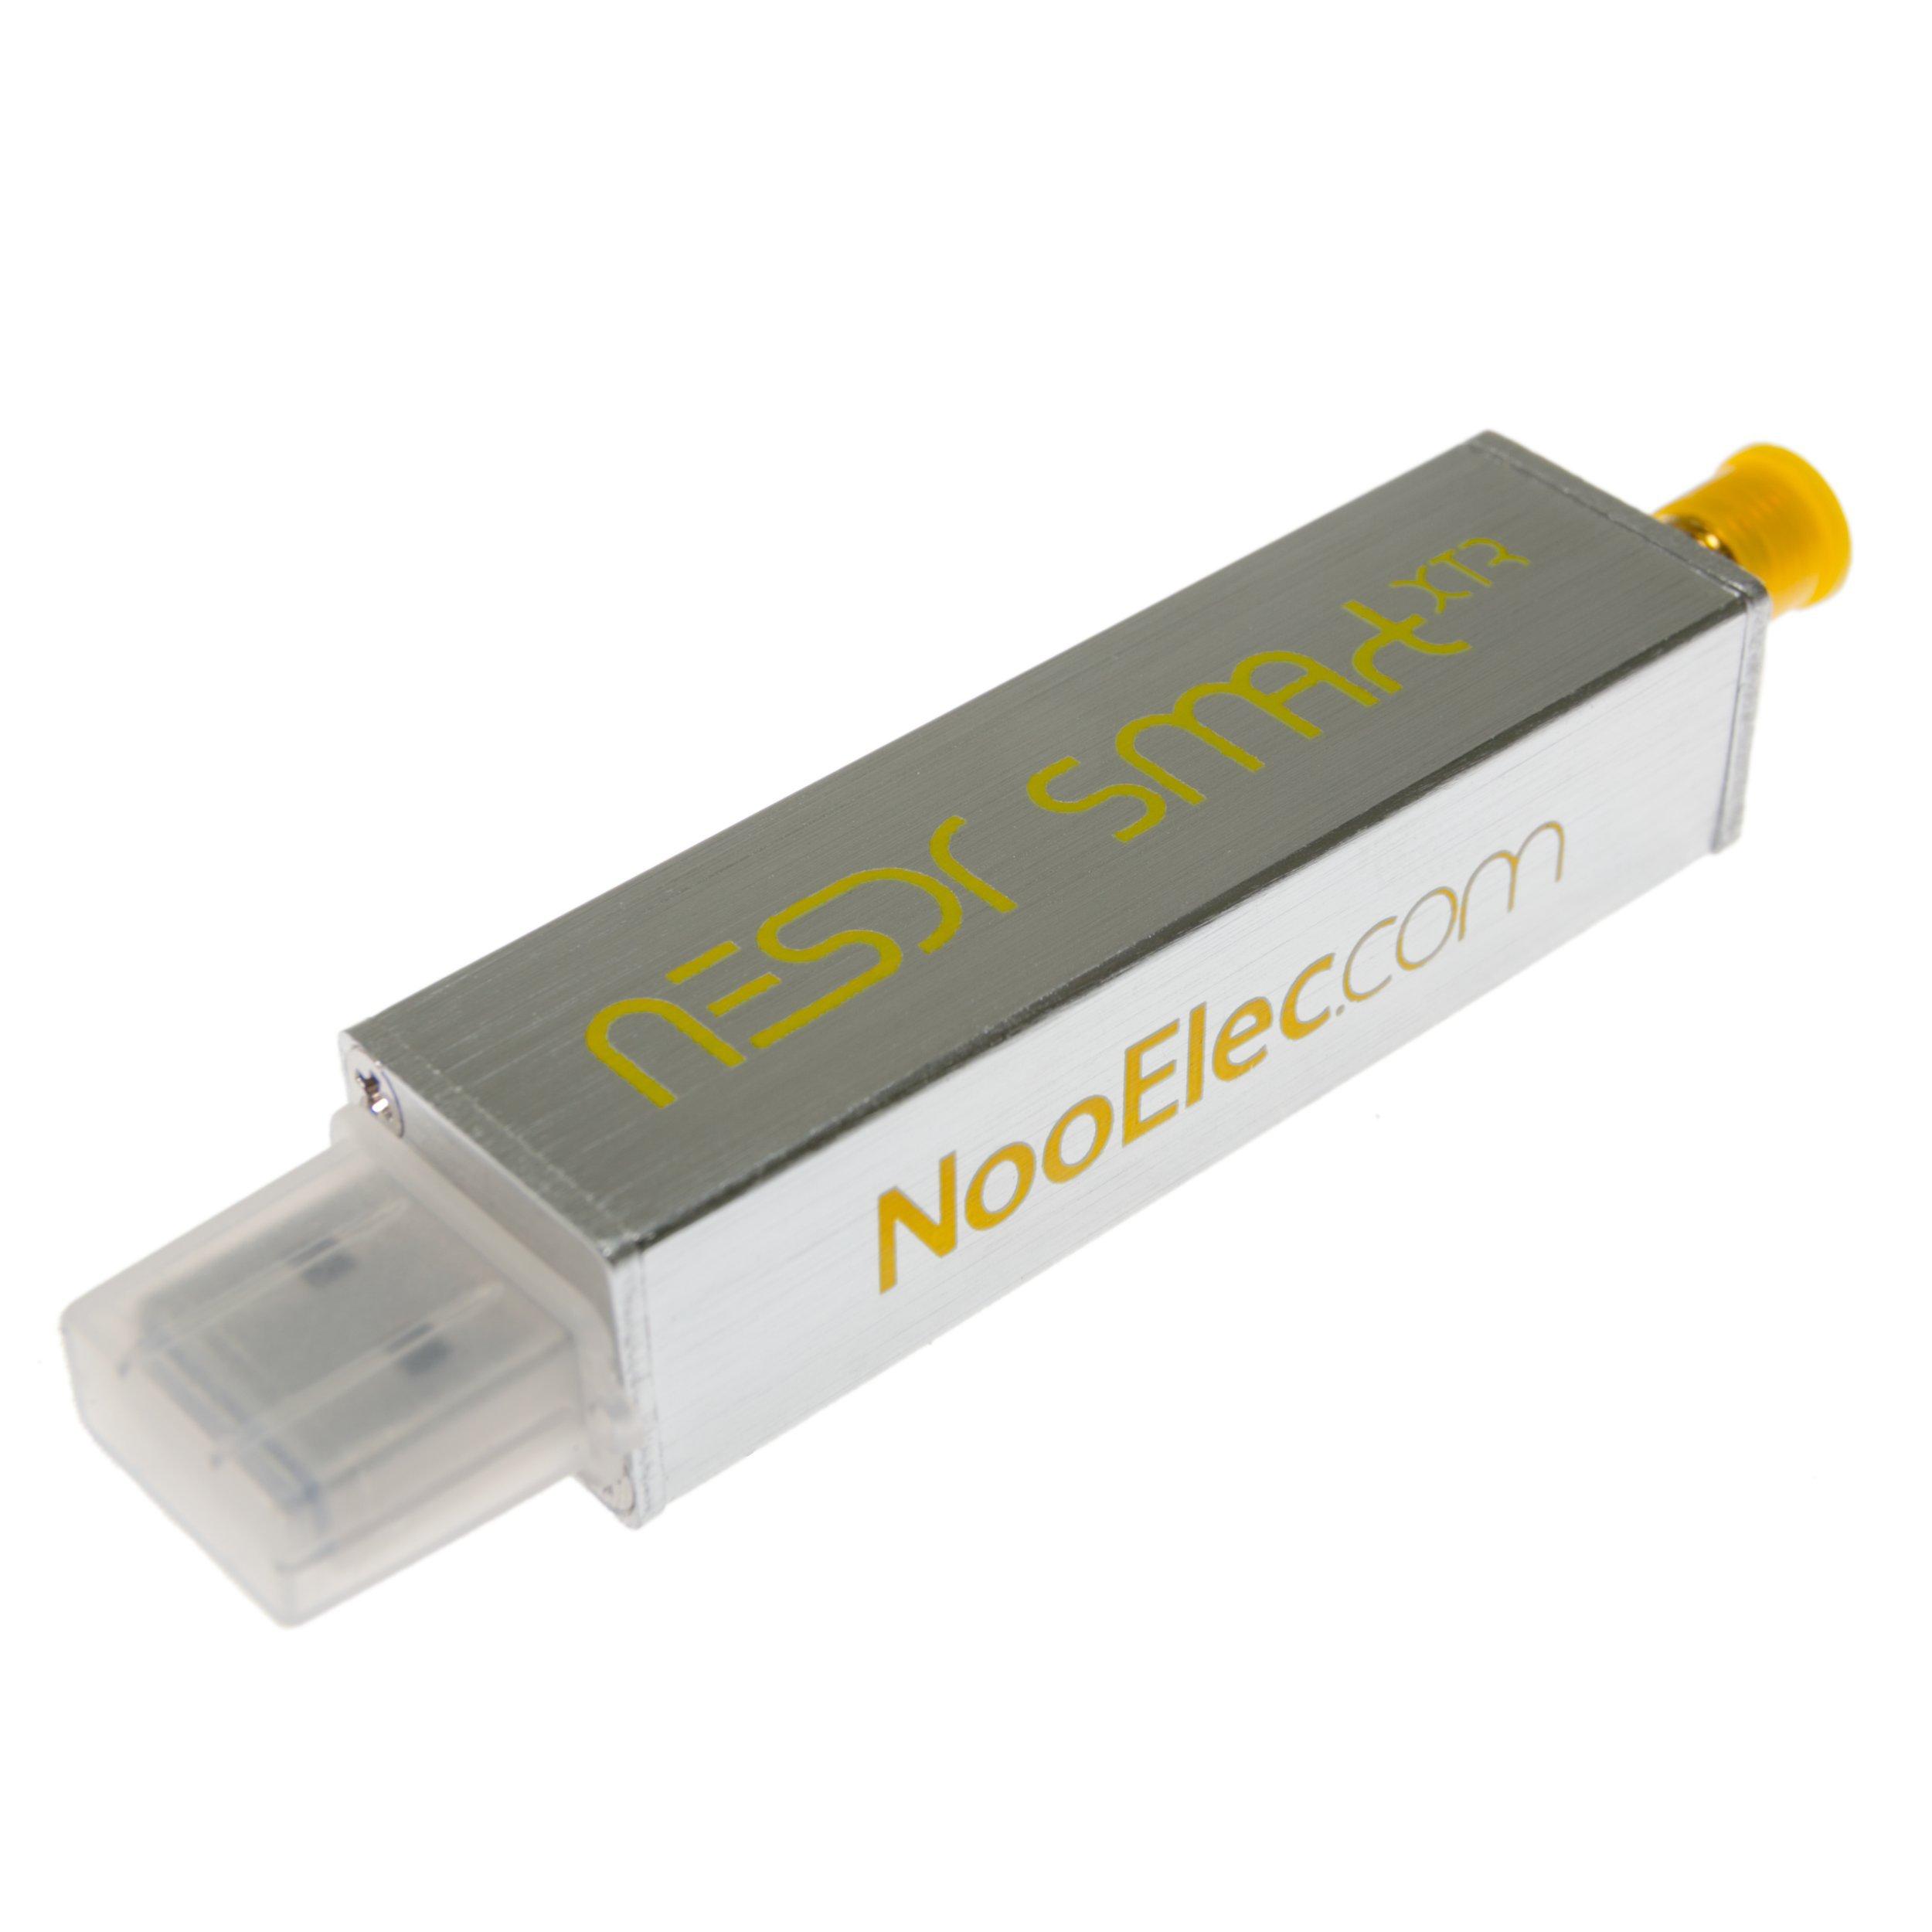 NooElec NESDR SMArt XTR SDR - Premium RTL-SDR w/Extended Tuning Range, Aluminum Enclosure, 0.5PPM TCXO, SMA Input. RTL2832U & E4000-Based Software Defined Radio by NooElec (Image #1)